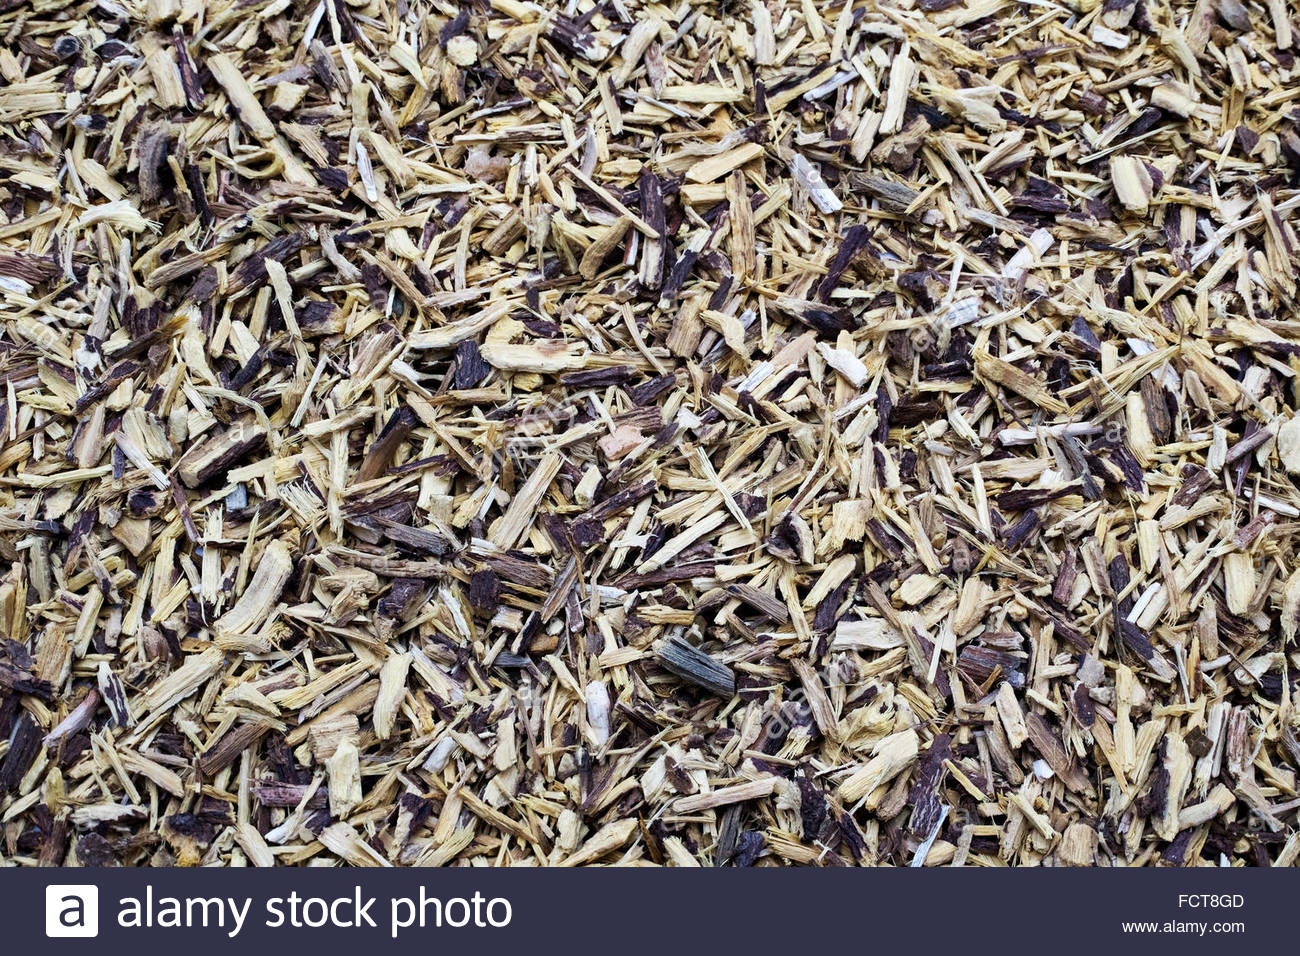 Liquorice (licorice), Glycyrrhiza glabra, Lakritz, Sussholz — root used for flavoring and folk medicine. Stock Photo